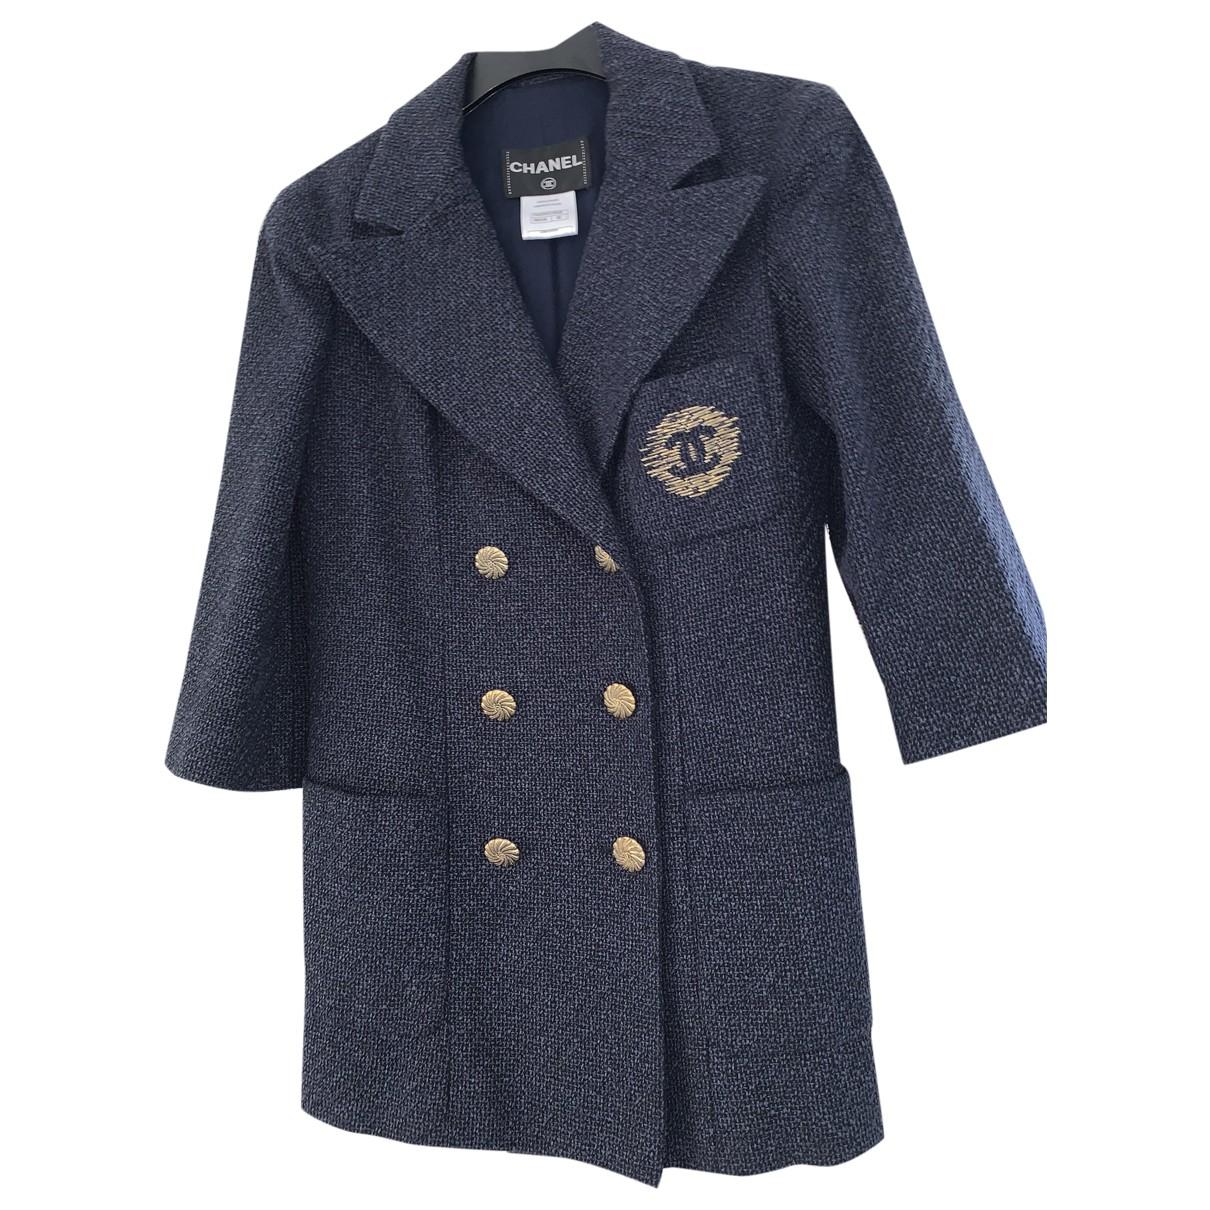 Chanel \N Blue Cotton jacket for Women 36 FR